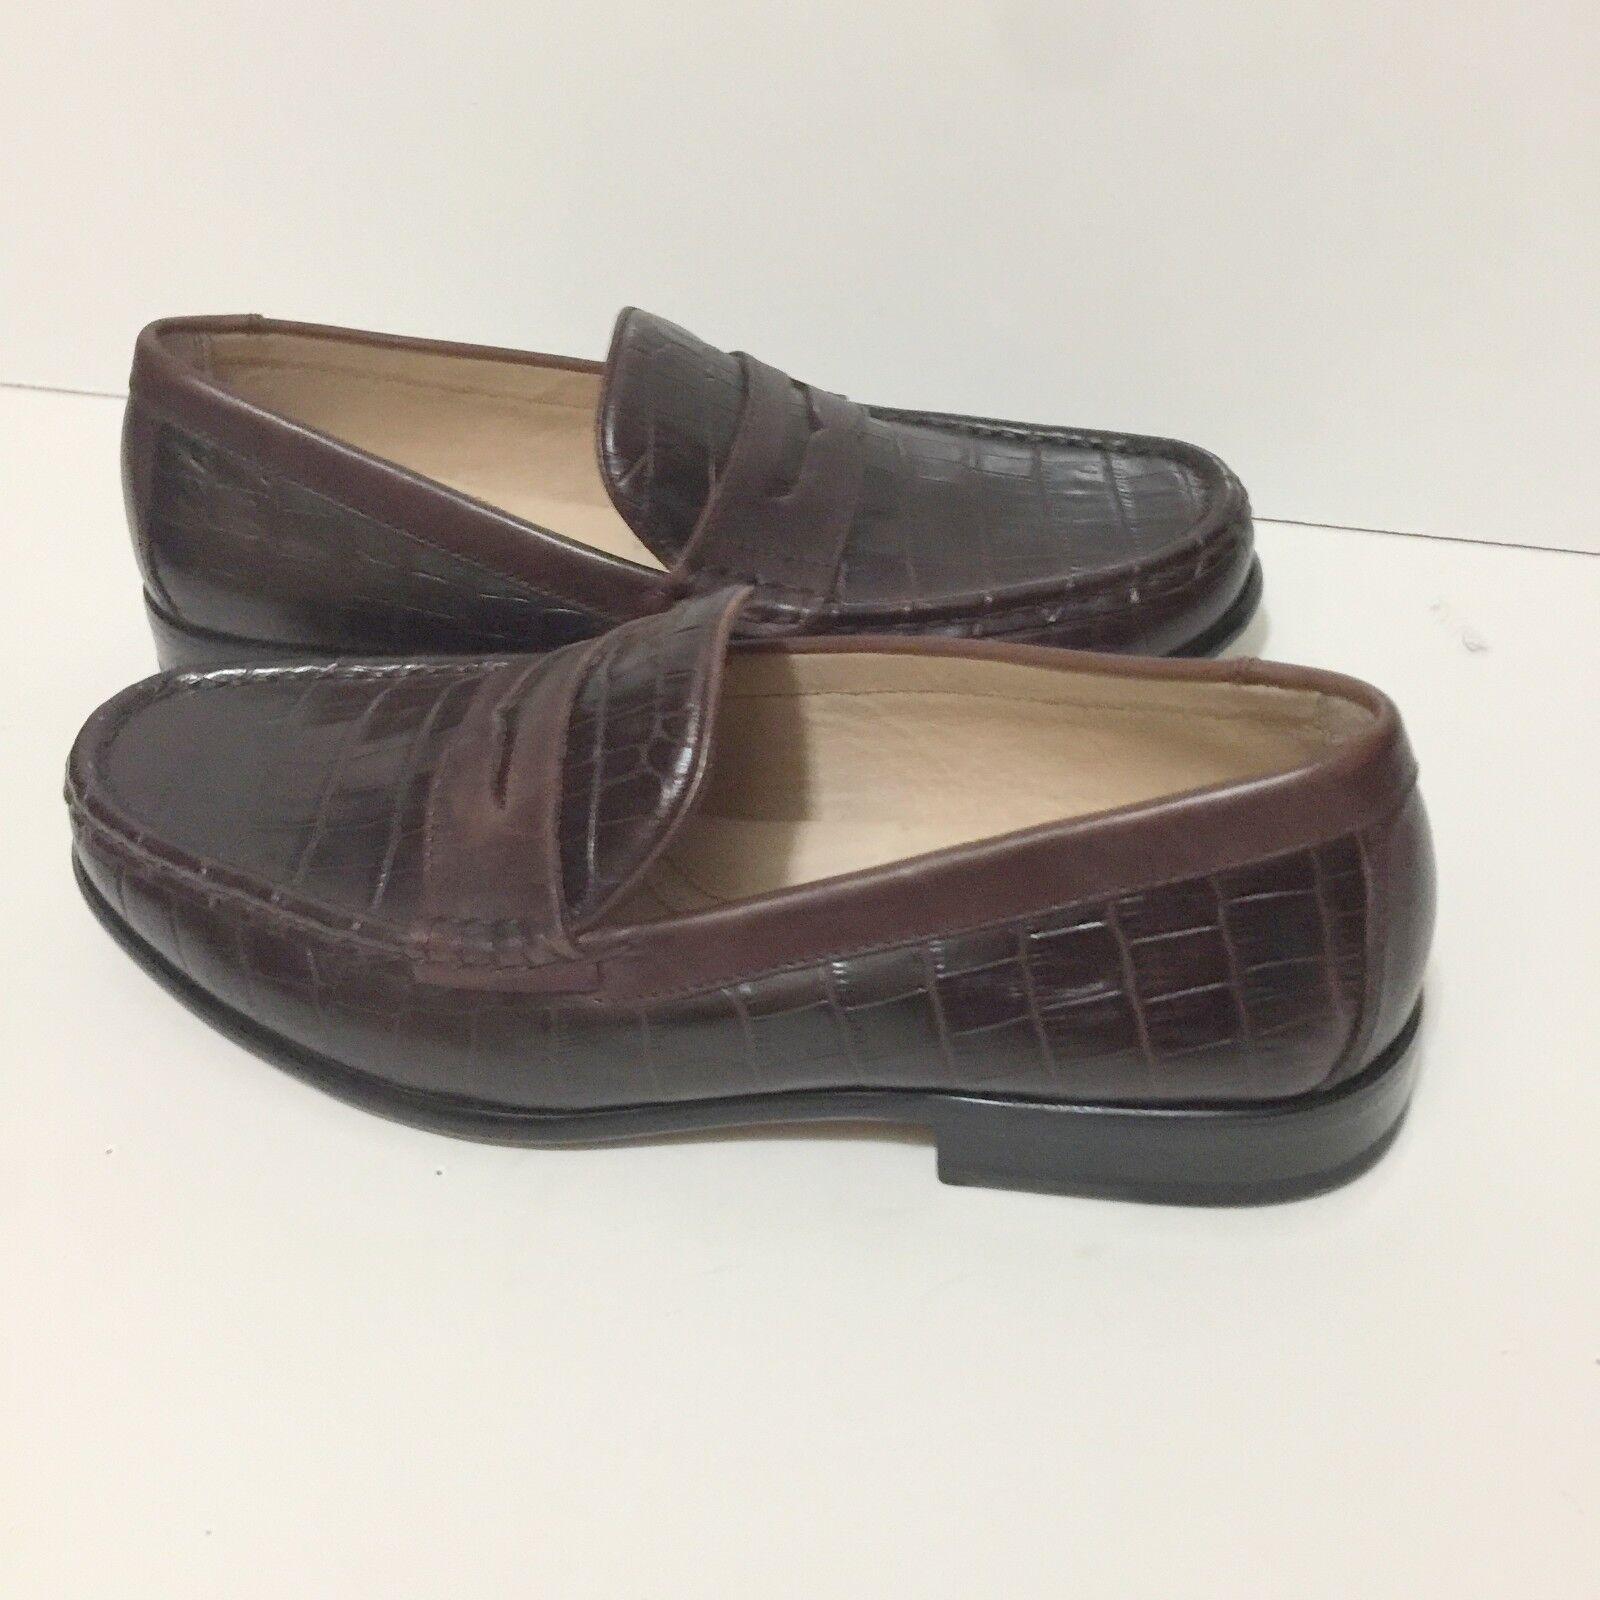 Domani Ballard Brown Croc Penny Loafers 9